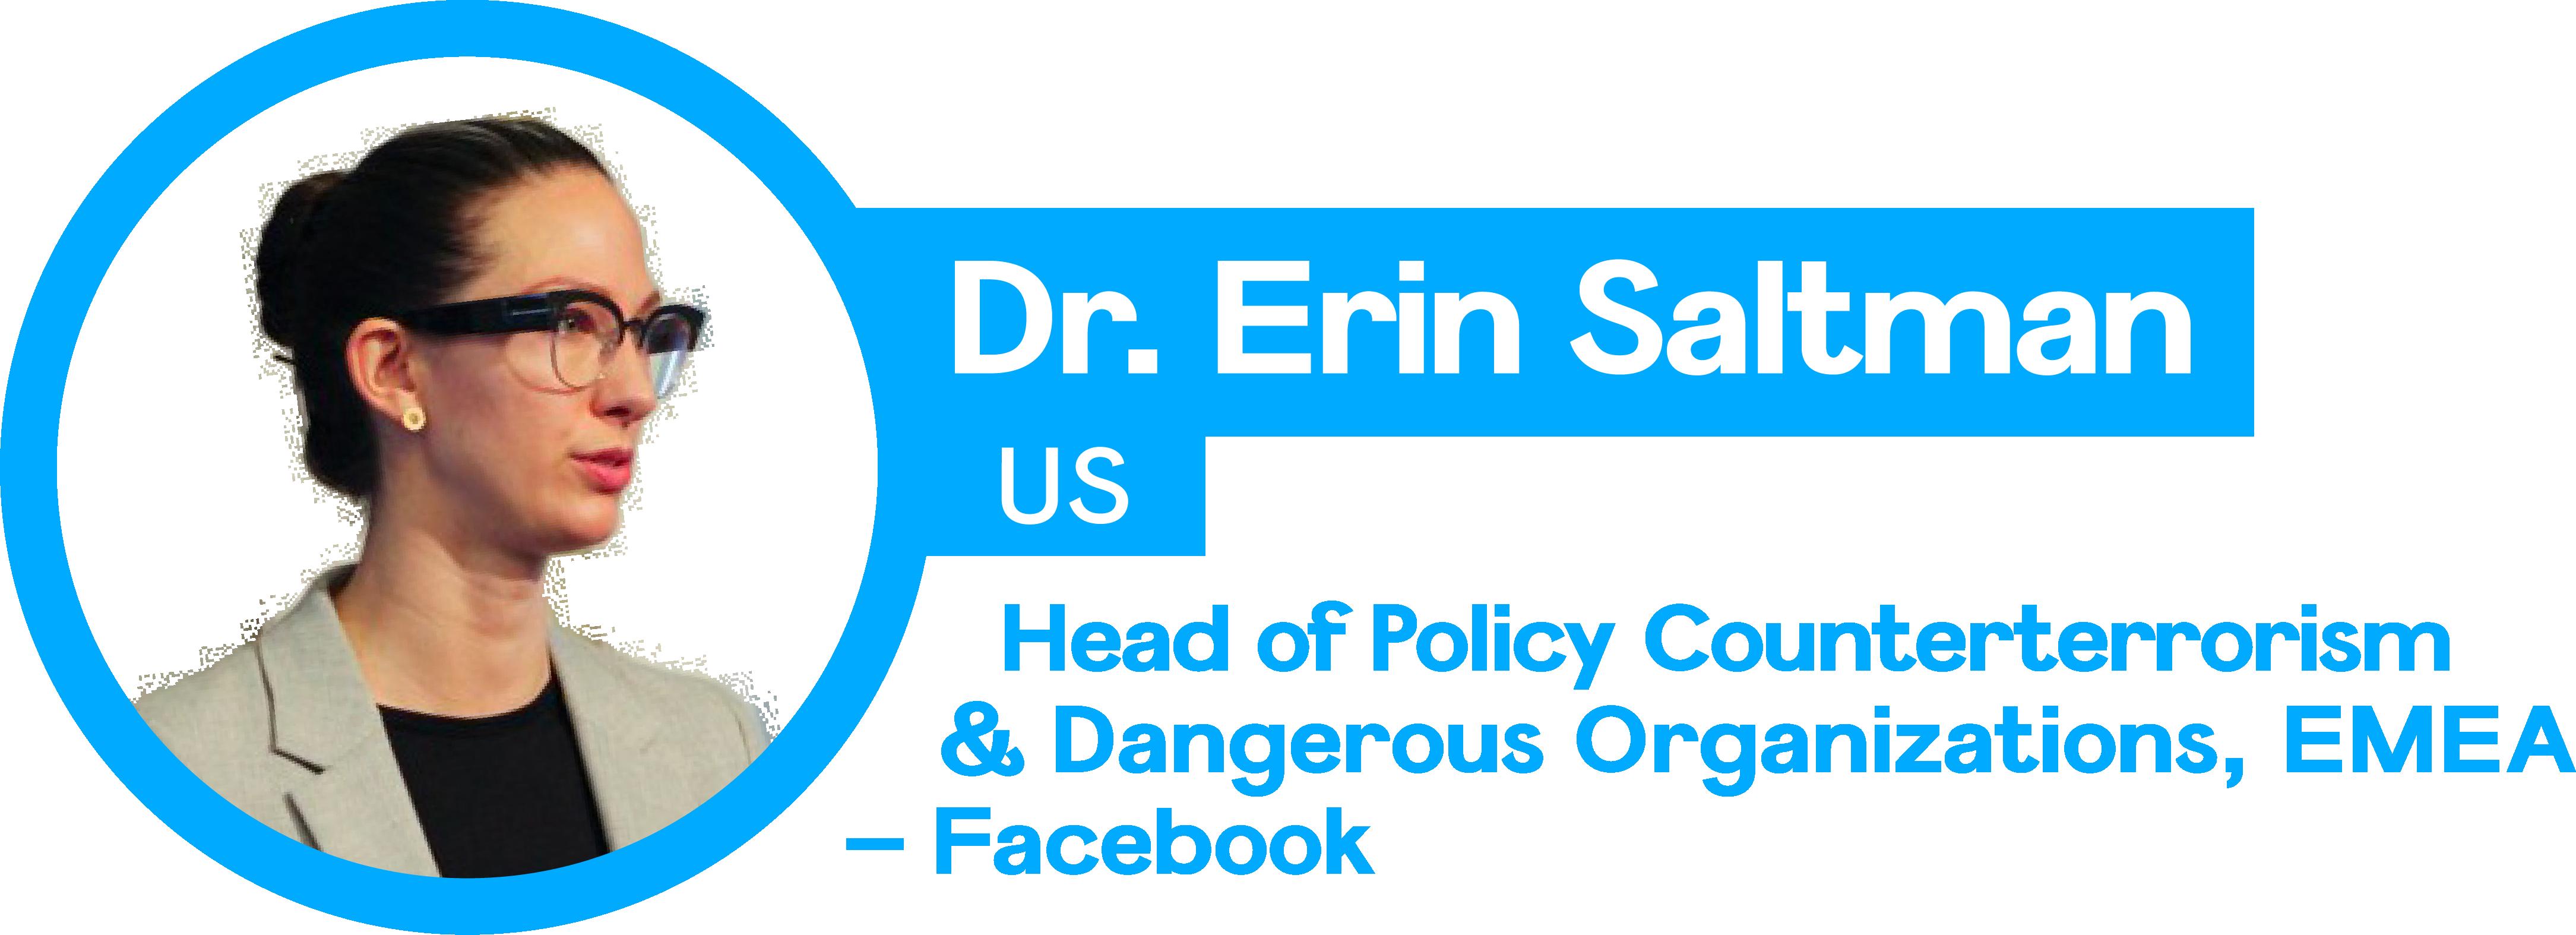 Dr. Erin Saltman